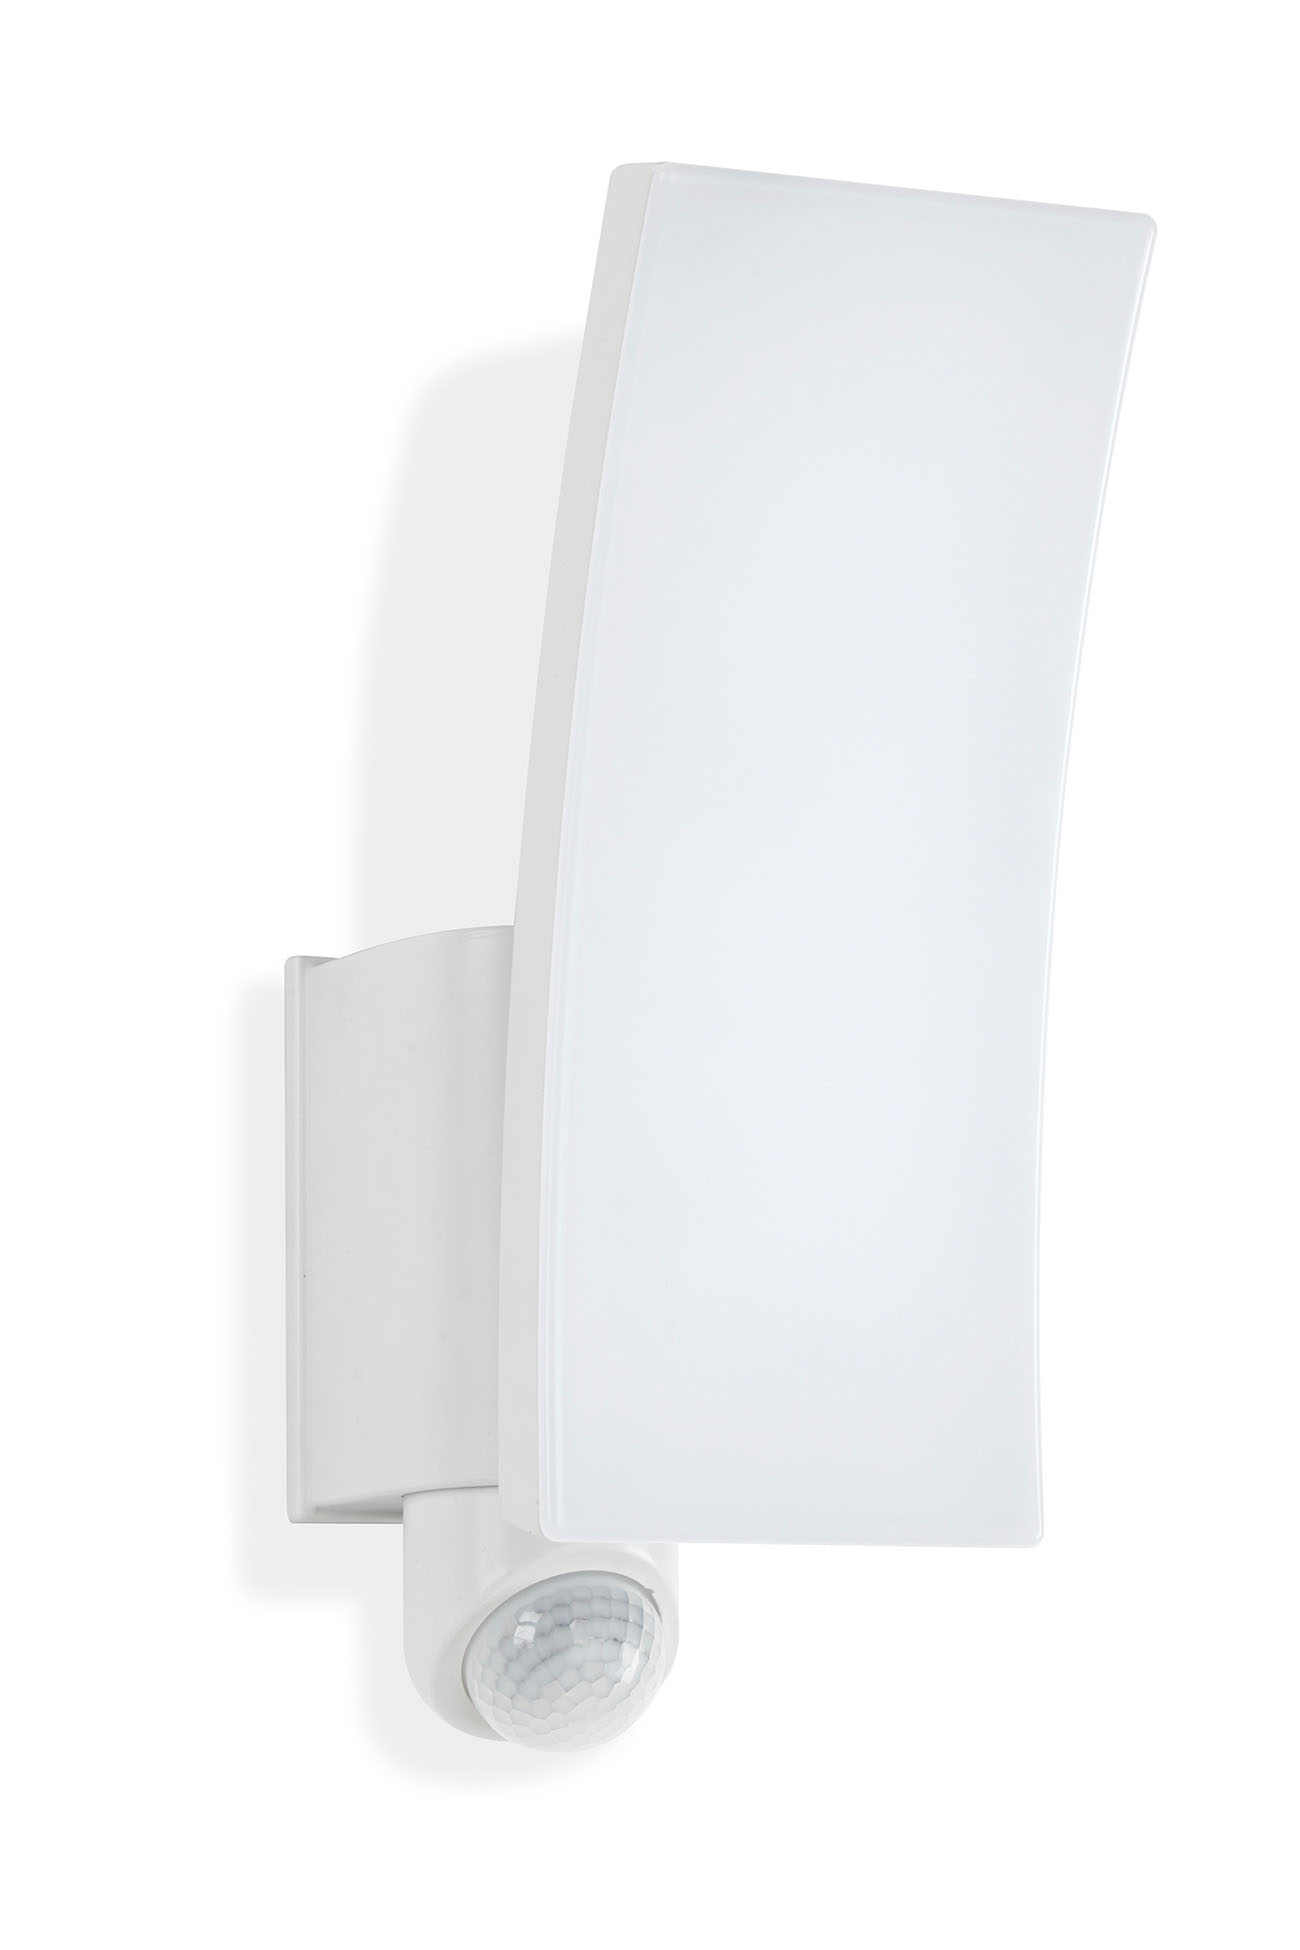 TELEFUNKEN LED Sensor Außenstrahler, 32,5 cm, 30 W, Weiß